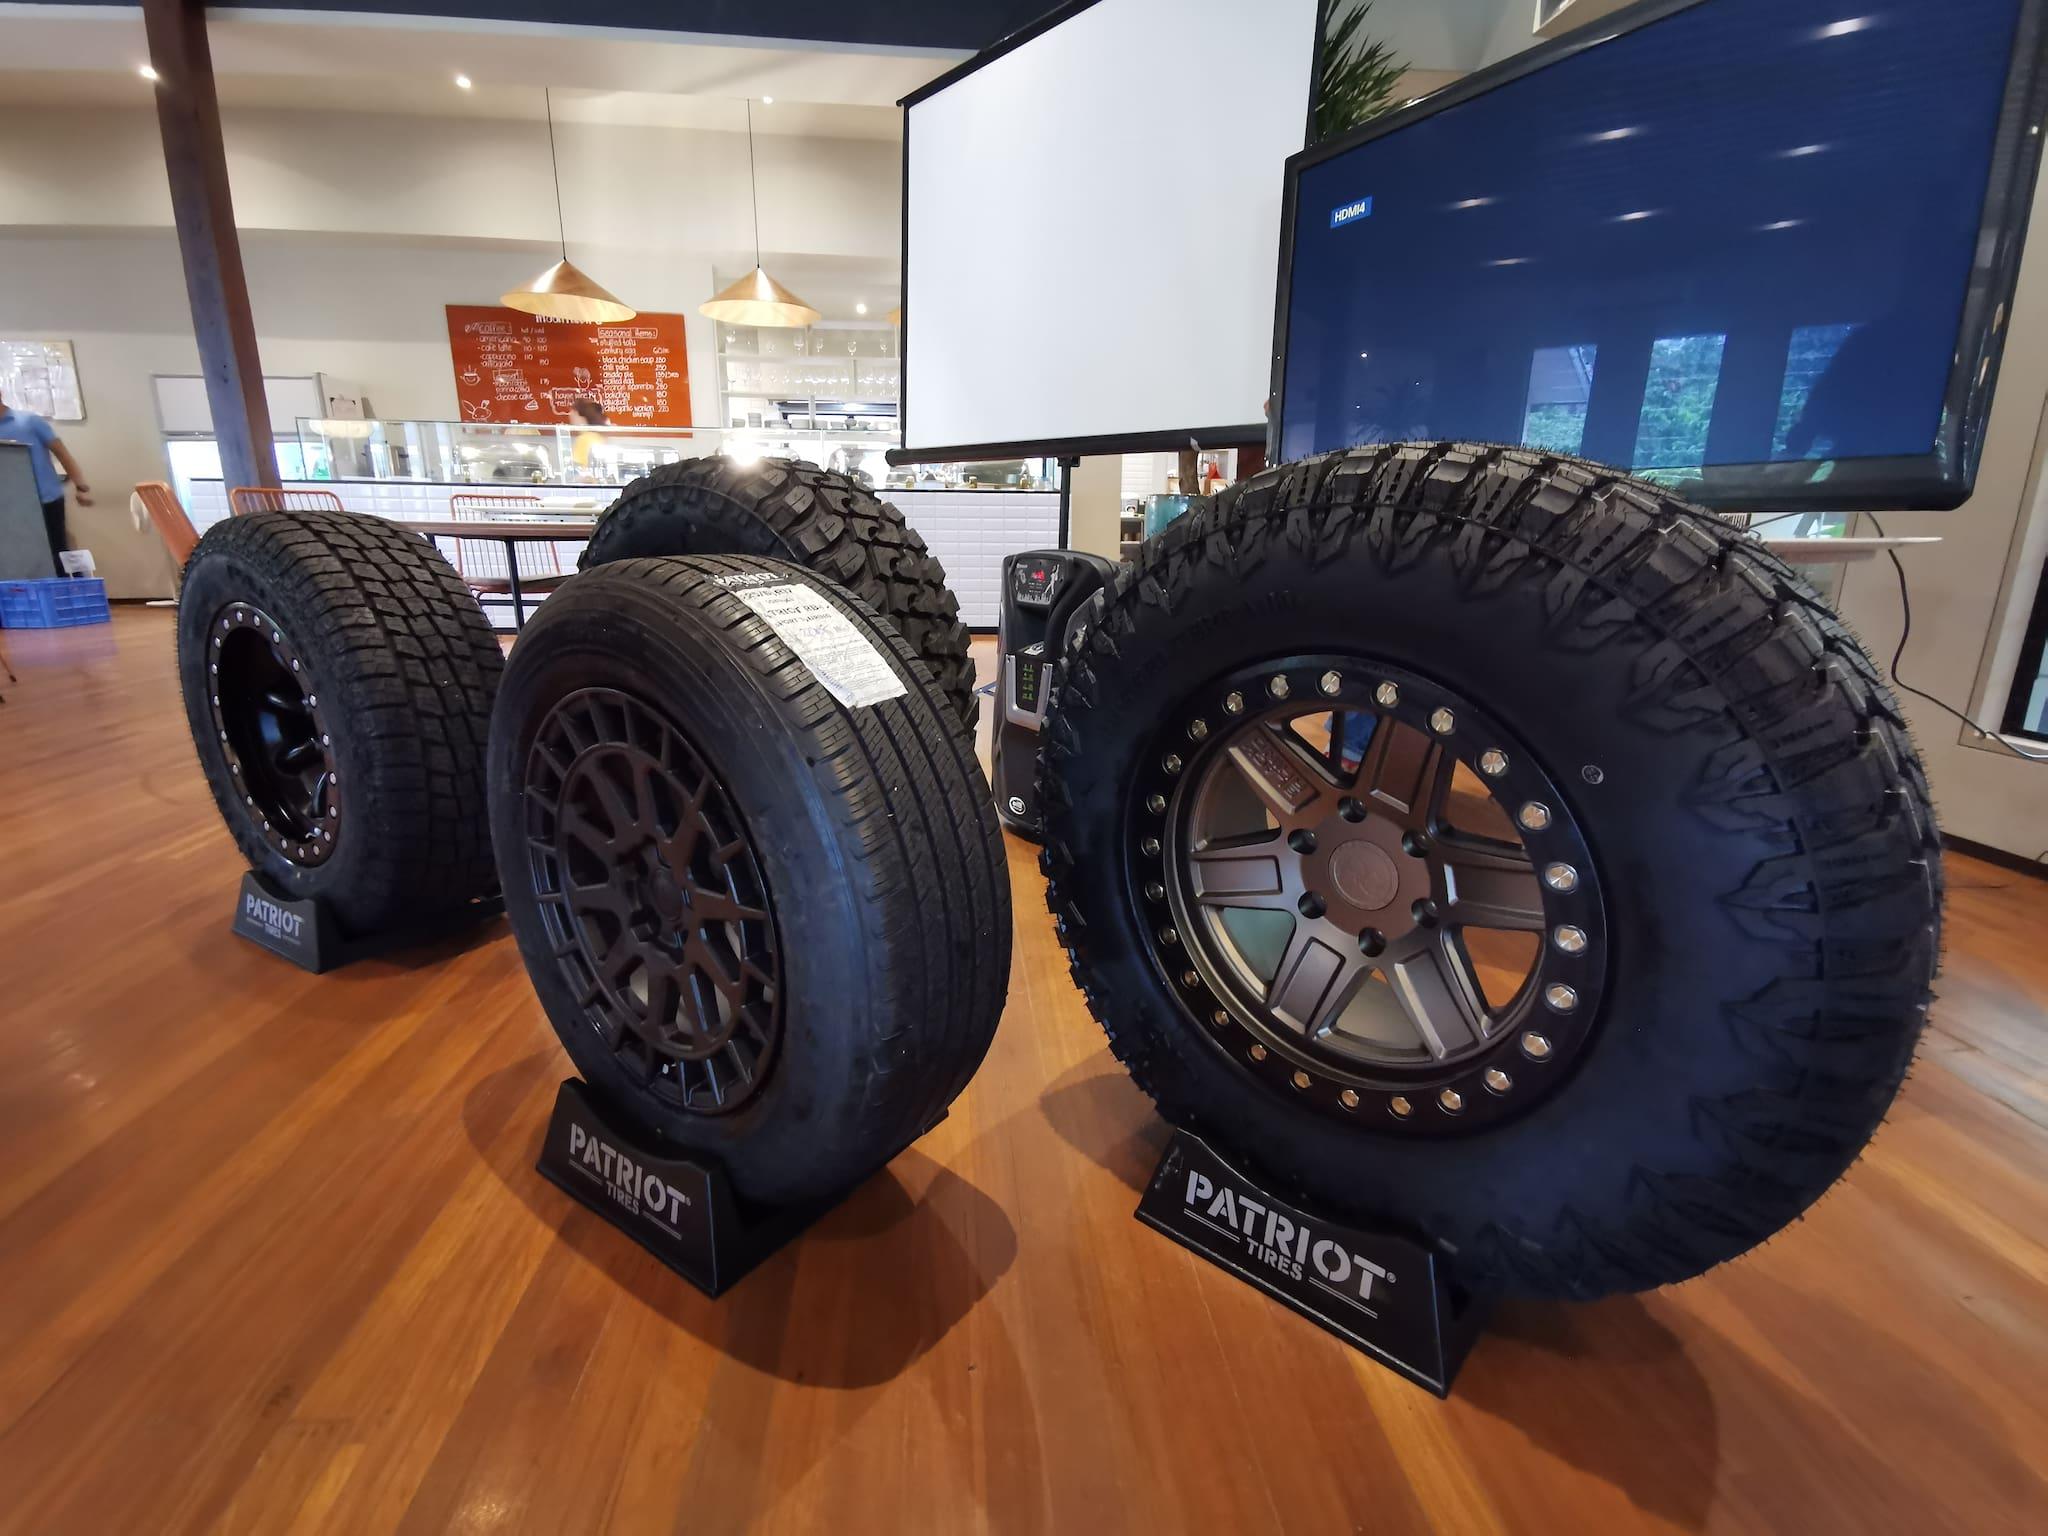 Patriot Tires Now in PH